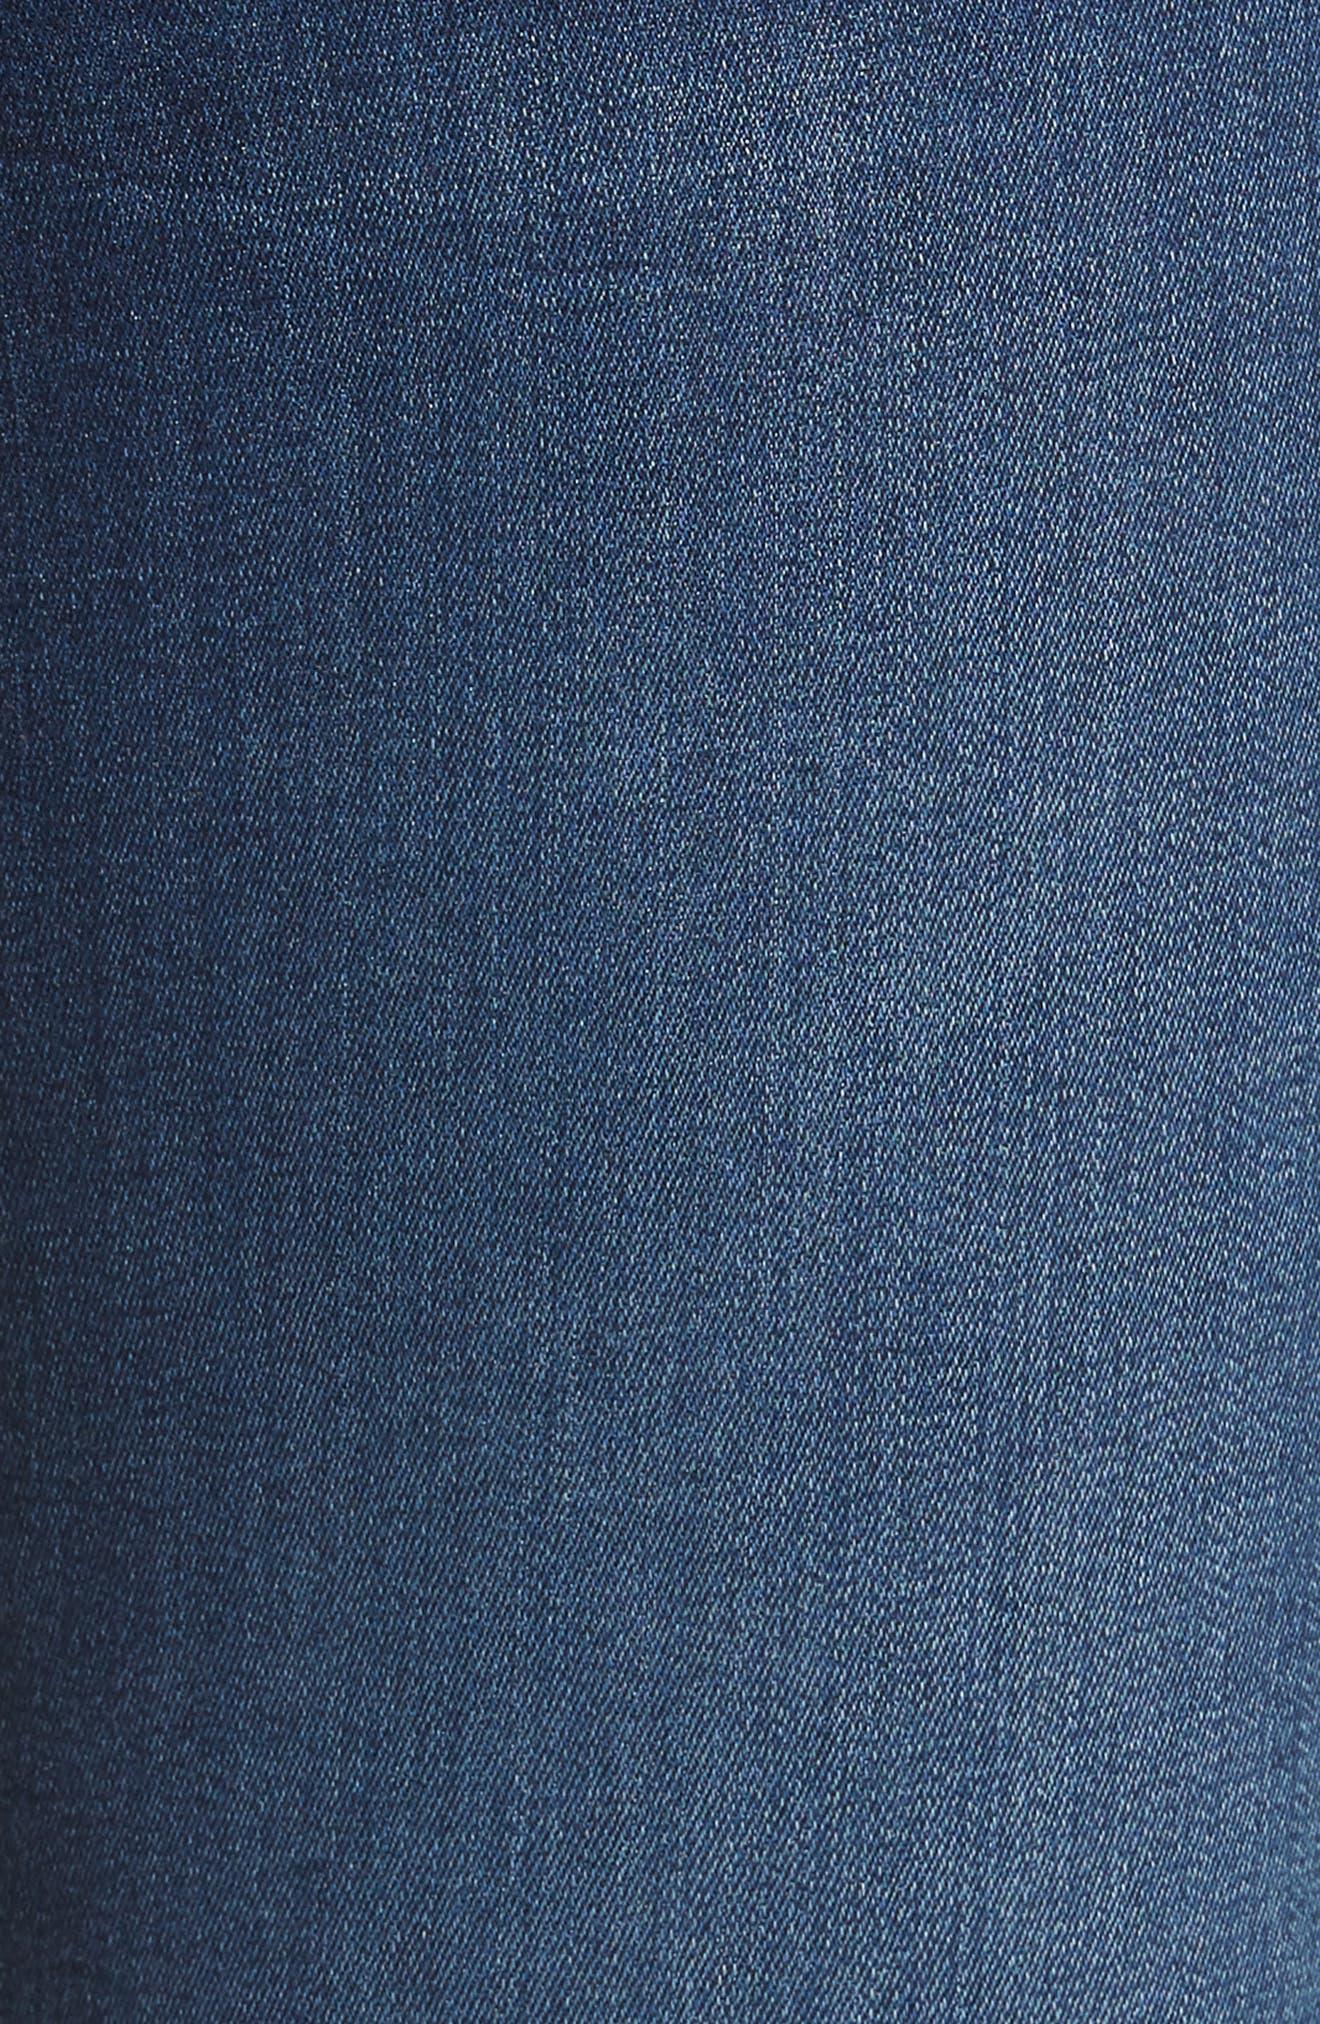 b(air) - Aubrey High Waist Skinny Jeans,                             Alternate thumbnail 6, color,                             Bair Fresh Rinse